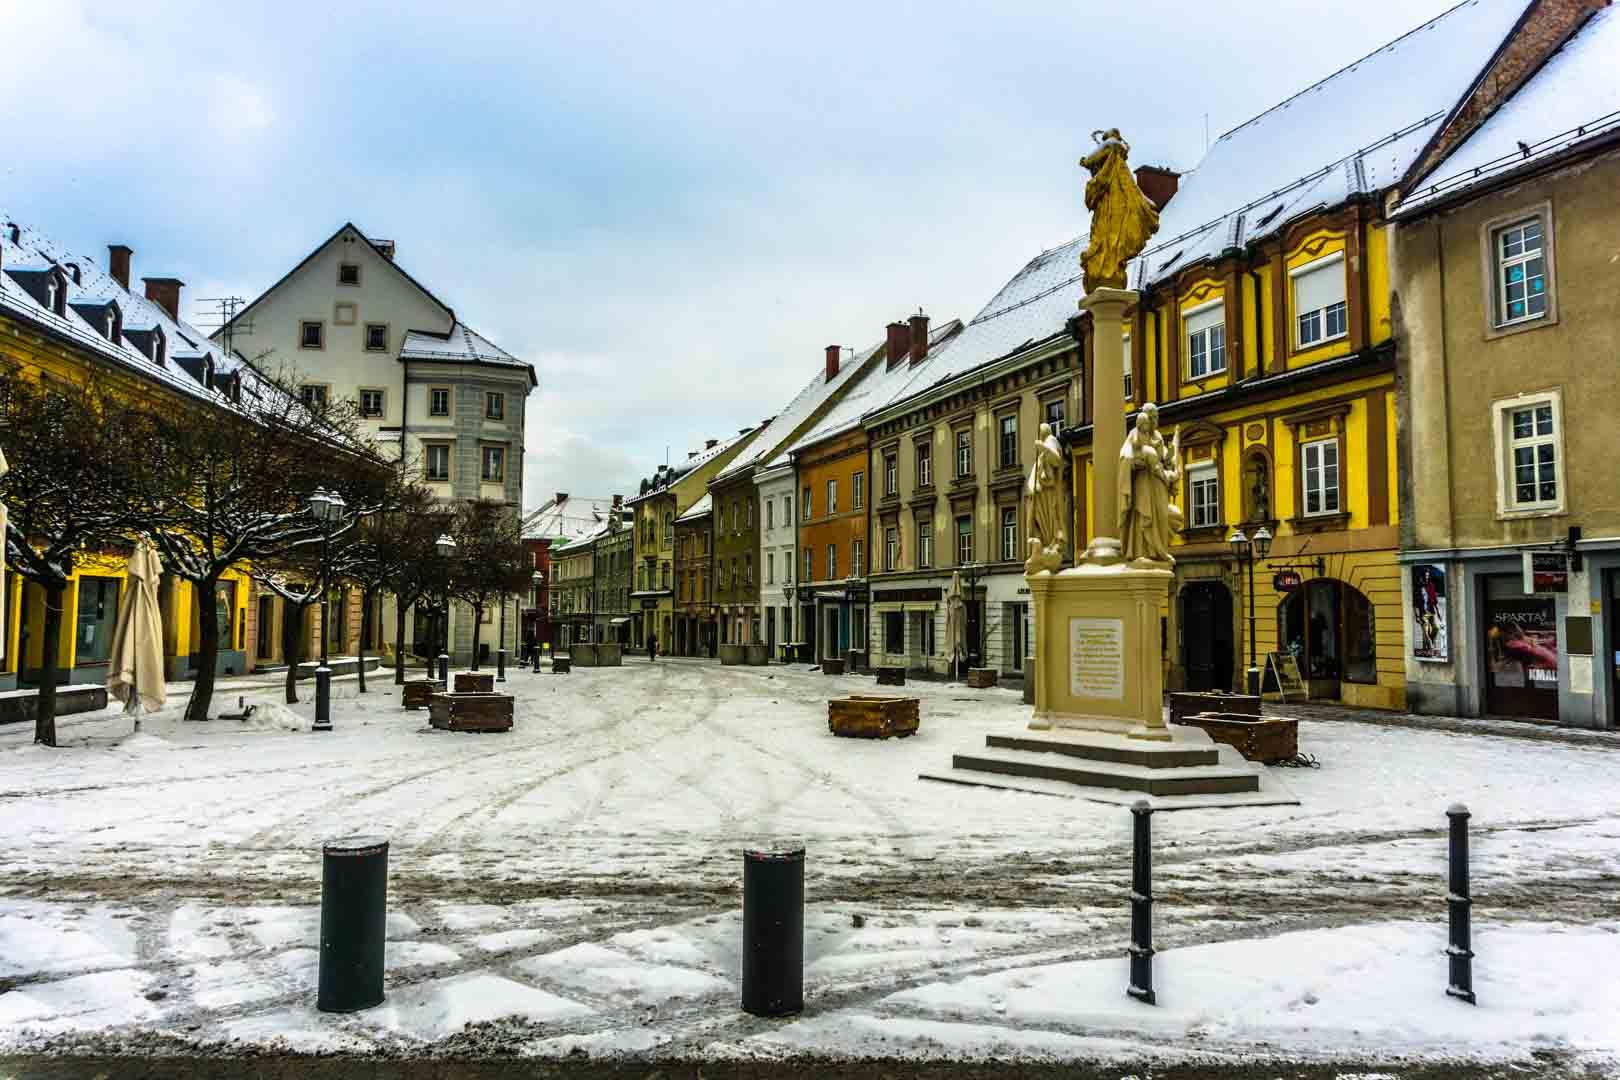 SerialHikers stop autostop world monde tour hitchhiking aventure adventure alternative travel voyage sans avion no fly Slovenia slovénie Celje artist castle